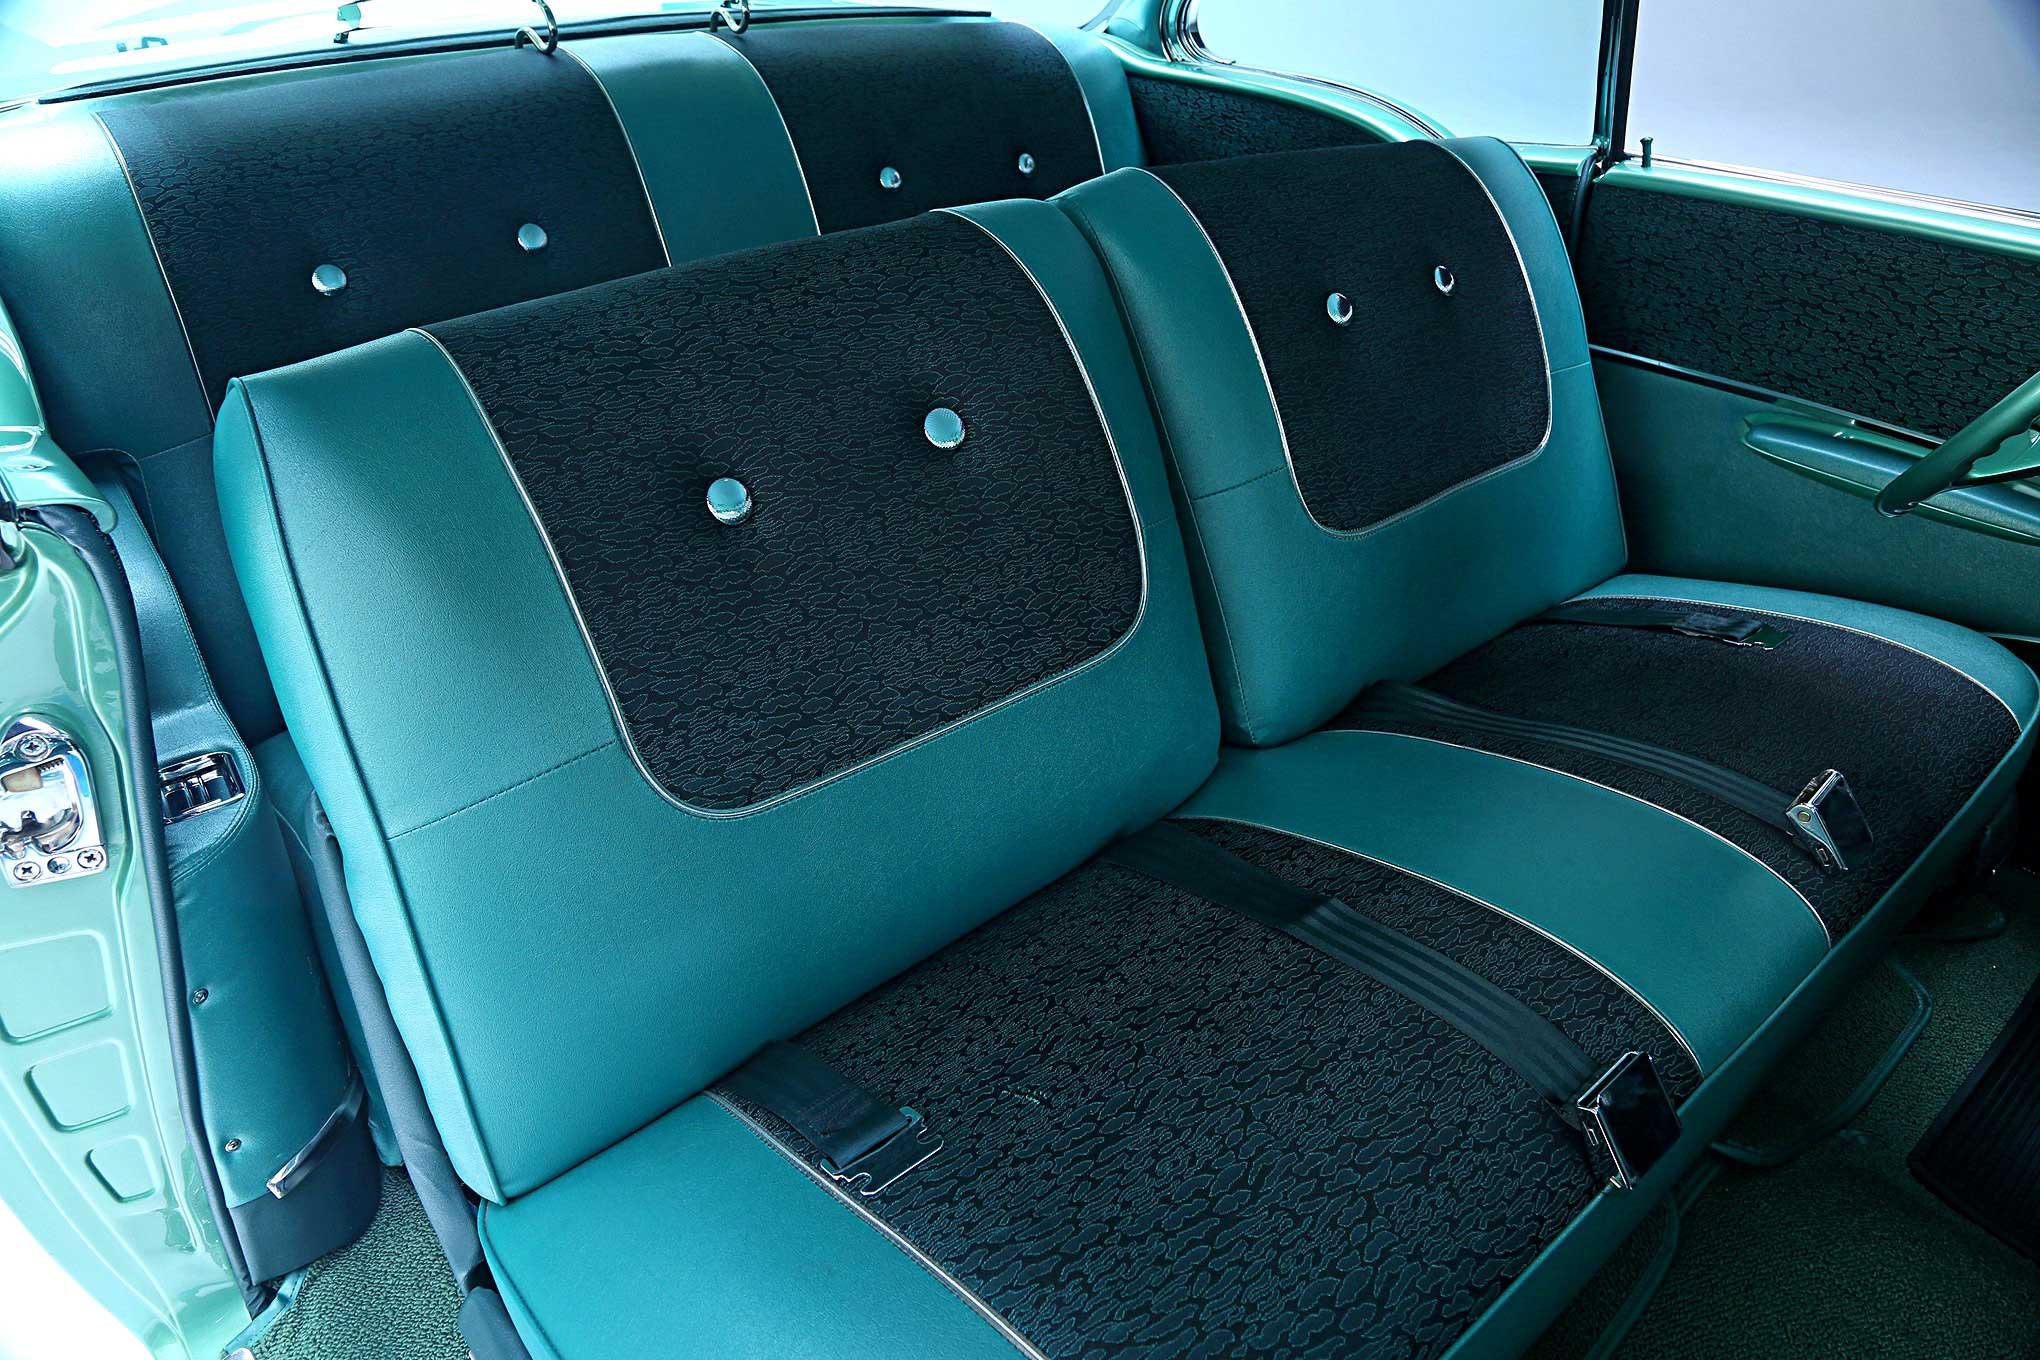 1957 Chevrolet Bel Air Green And Black Vinyl Interior Lowrider